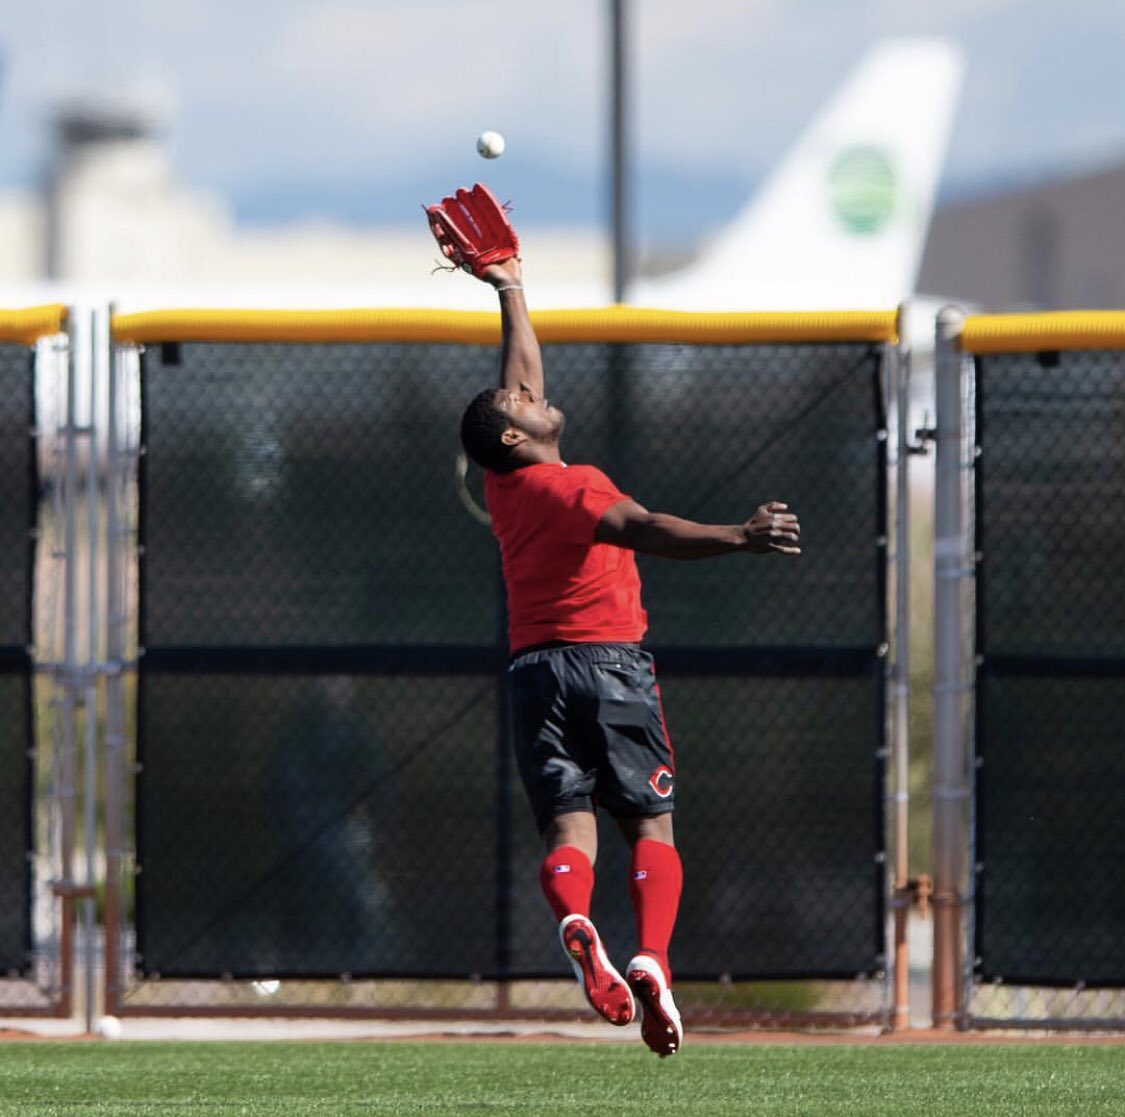 😭🐎 RT @YasielPuig: Work hard in silence , Let success make the noise ... #theprocess #baseball #challenge #newyear #2019 #mlb